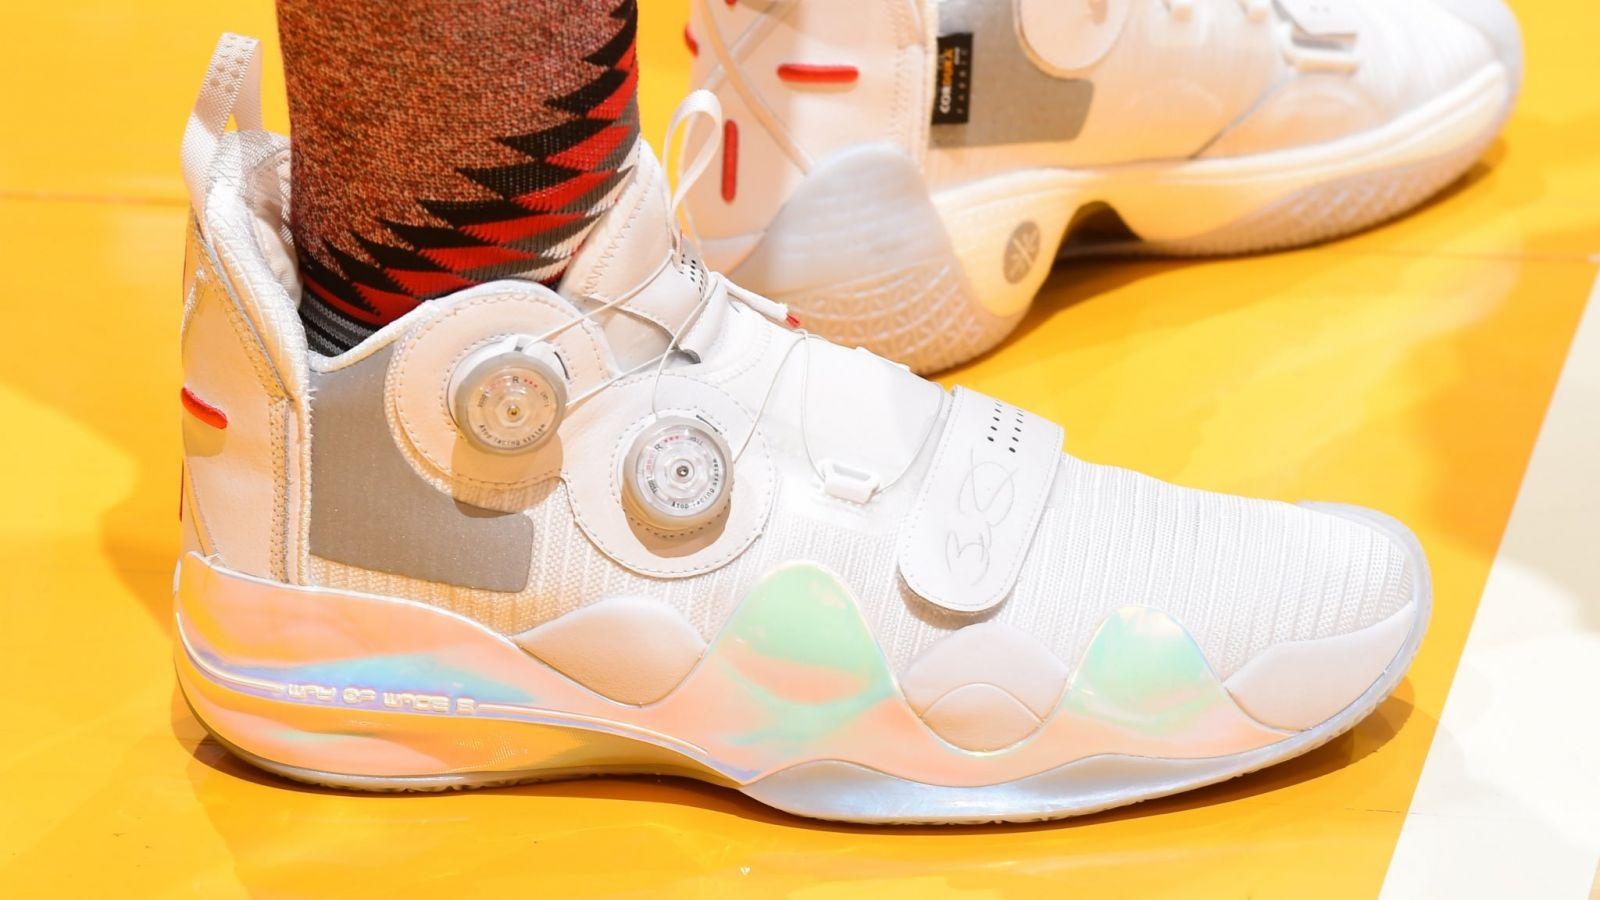 <b>今日常规赛上脚球鞋一览:场边观战韦德上脚韦德之道8</b>